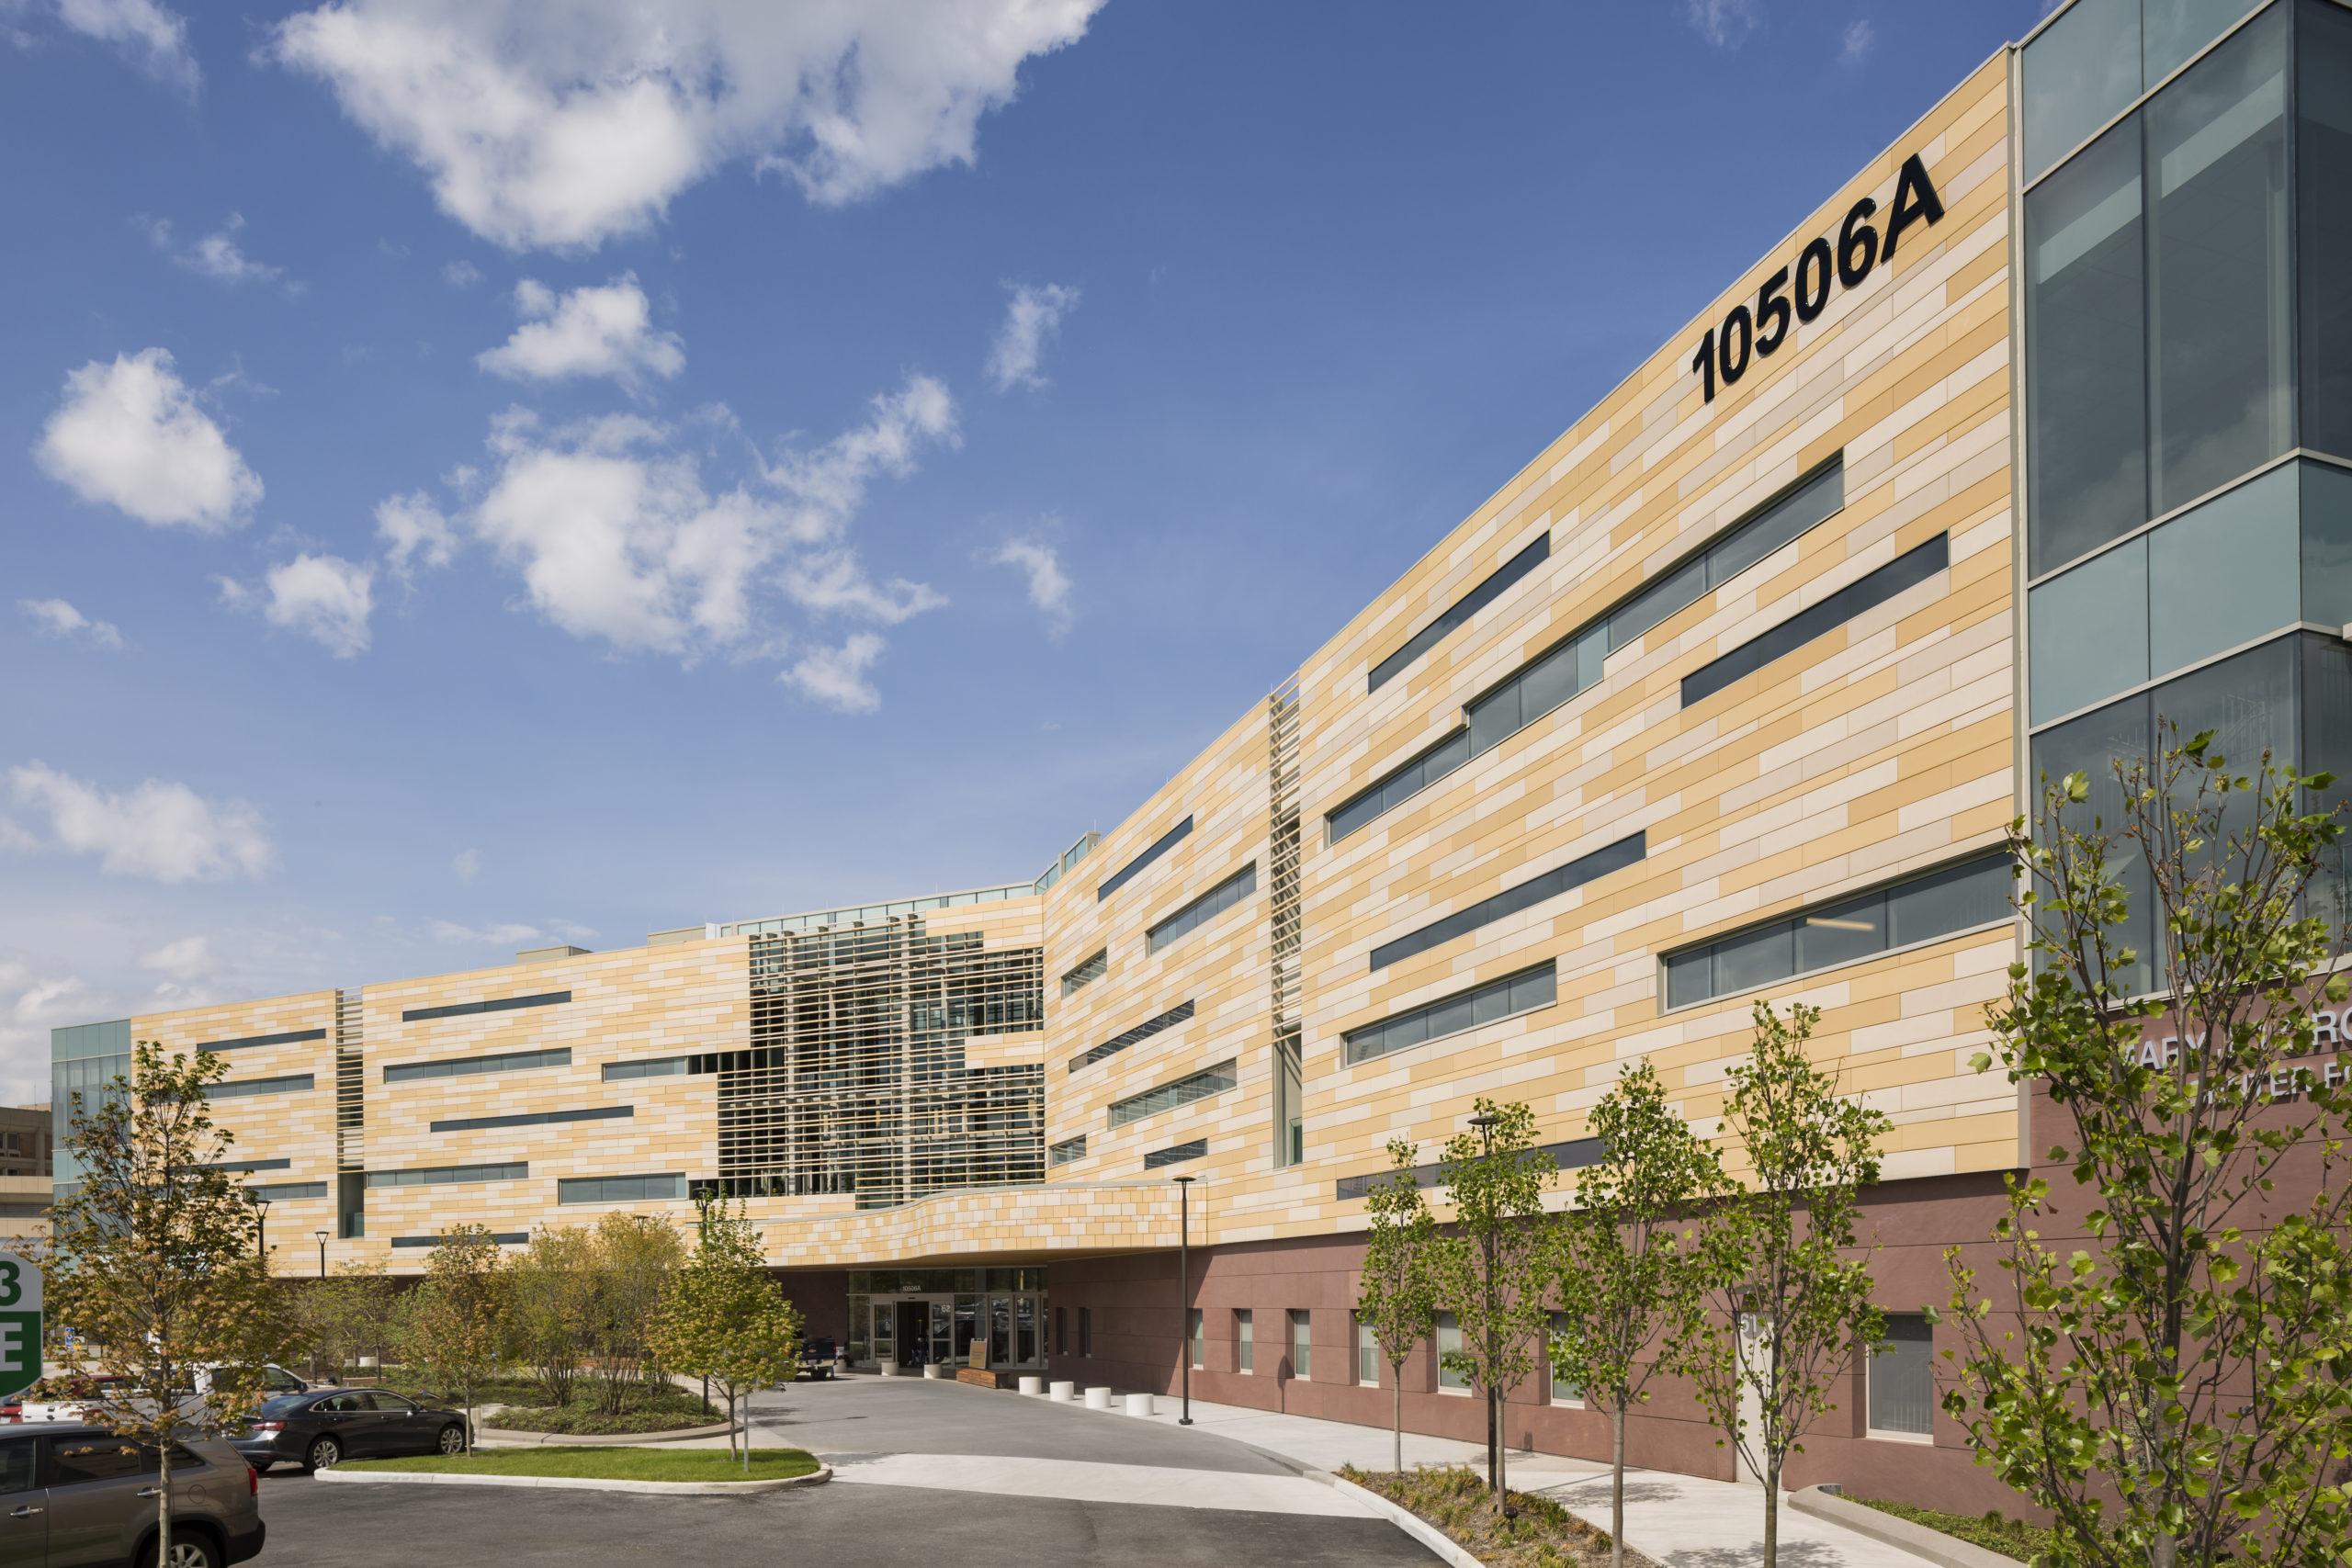 Bethesda North Hospital Terreal North America